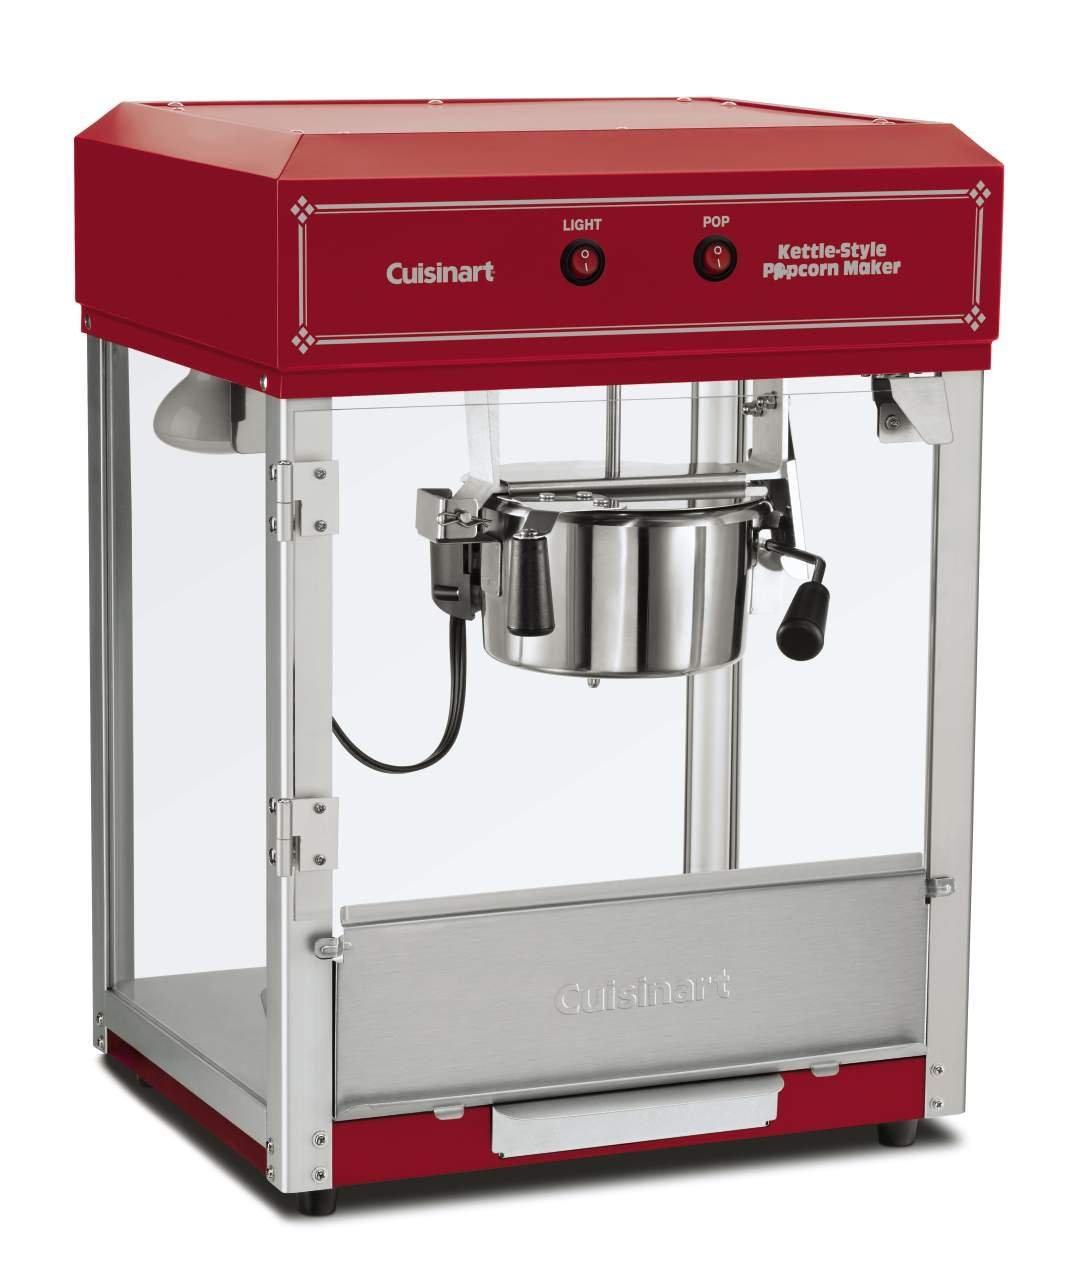 Cuisinart CPM-2500 Kettle-Style Popcorn Maker, Red